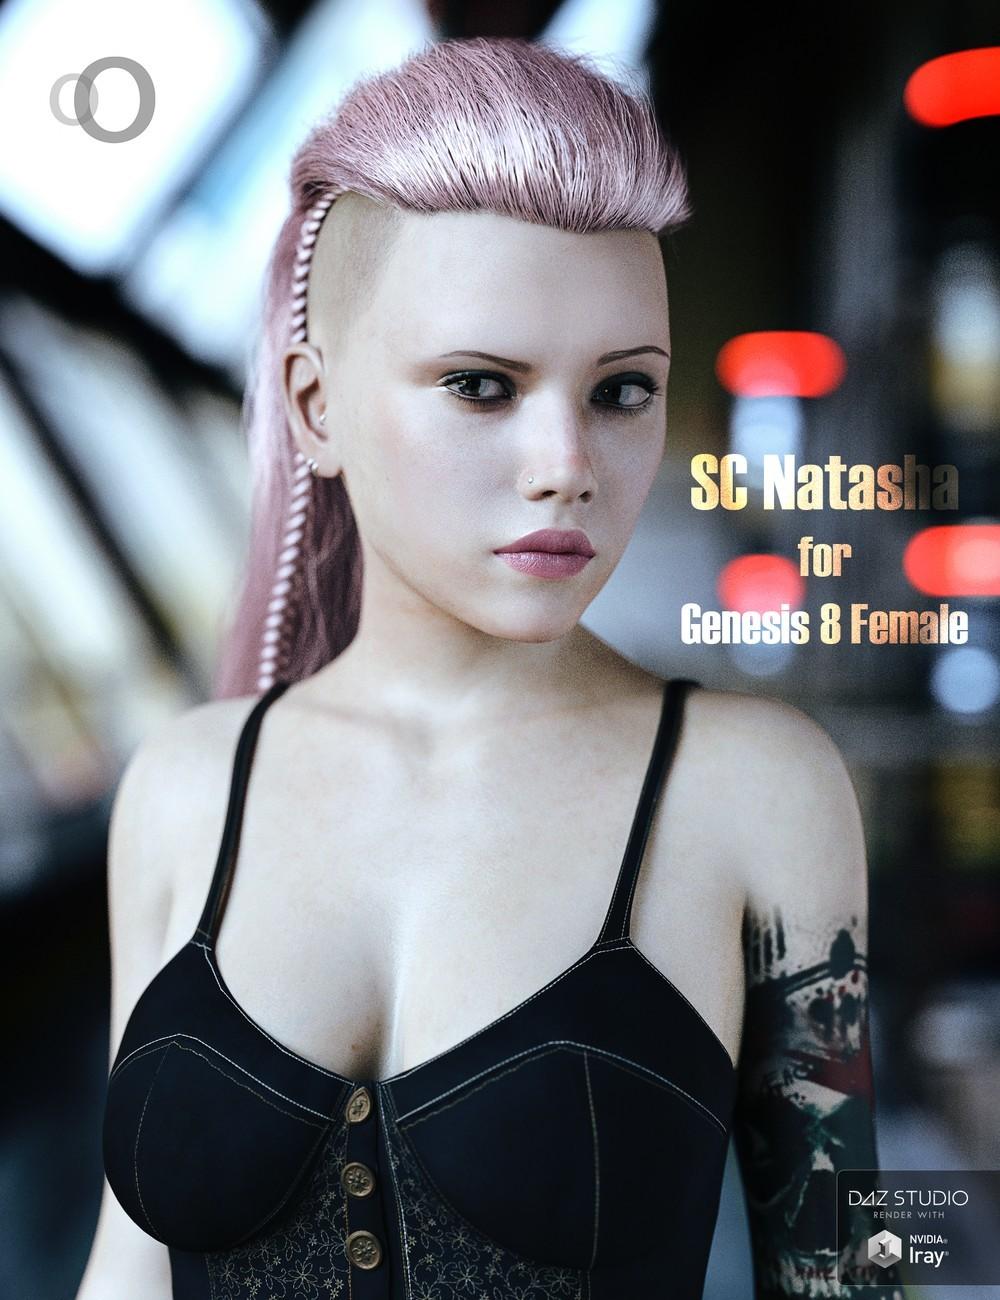 sc-natasha-for-genesis-8-female